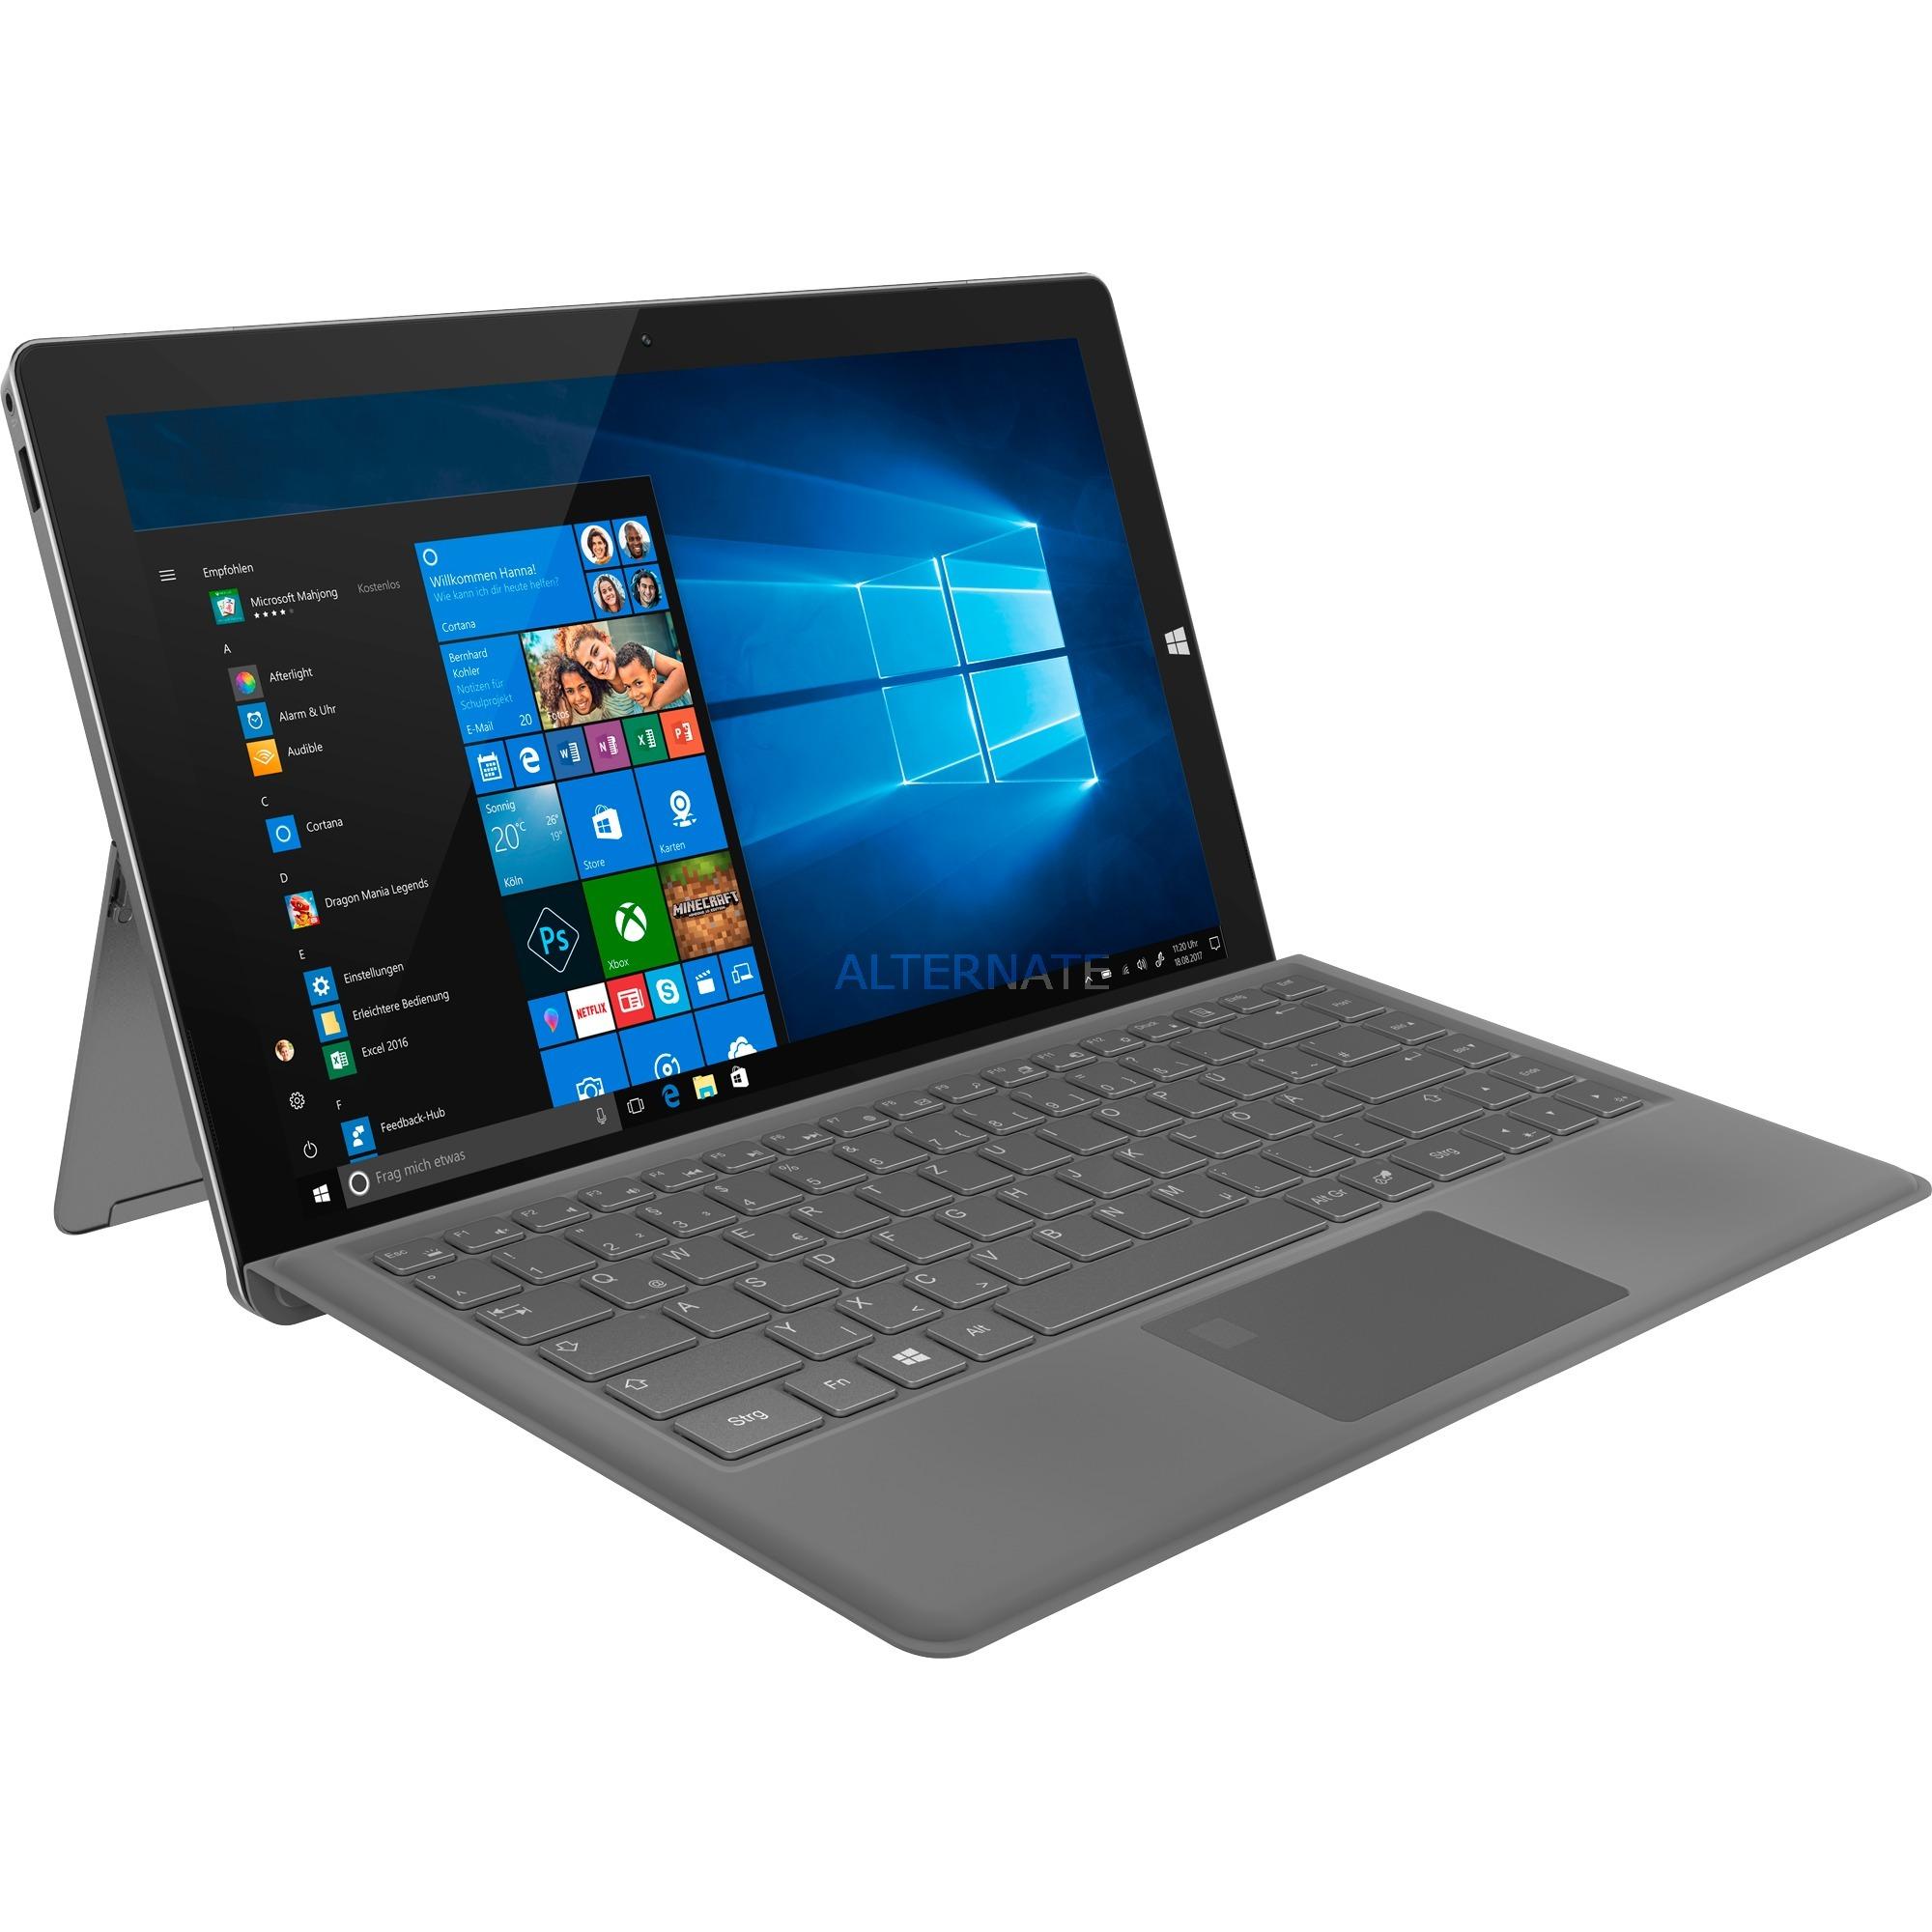 Primetab T13b-CO tablet Intel Celeron N3350 64 GB Negro, Tablet PC